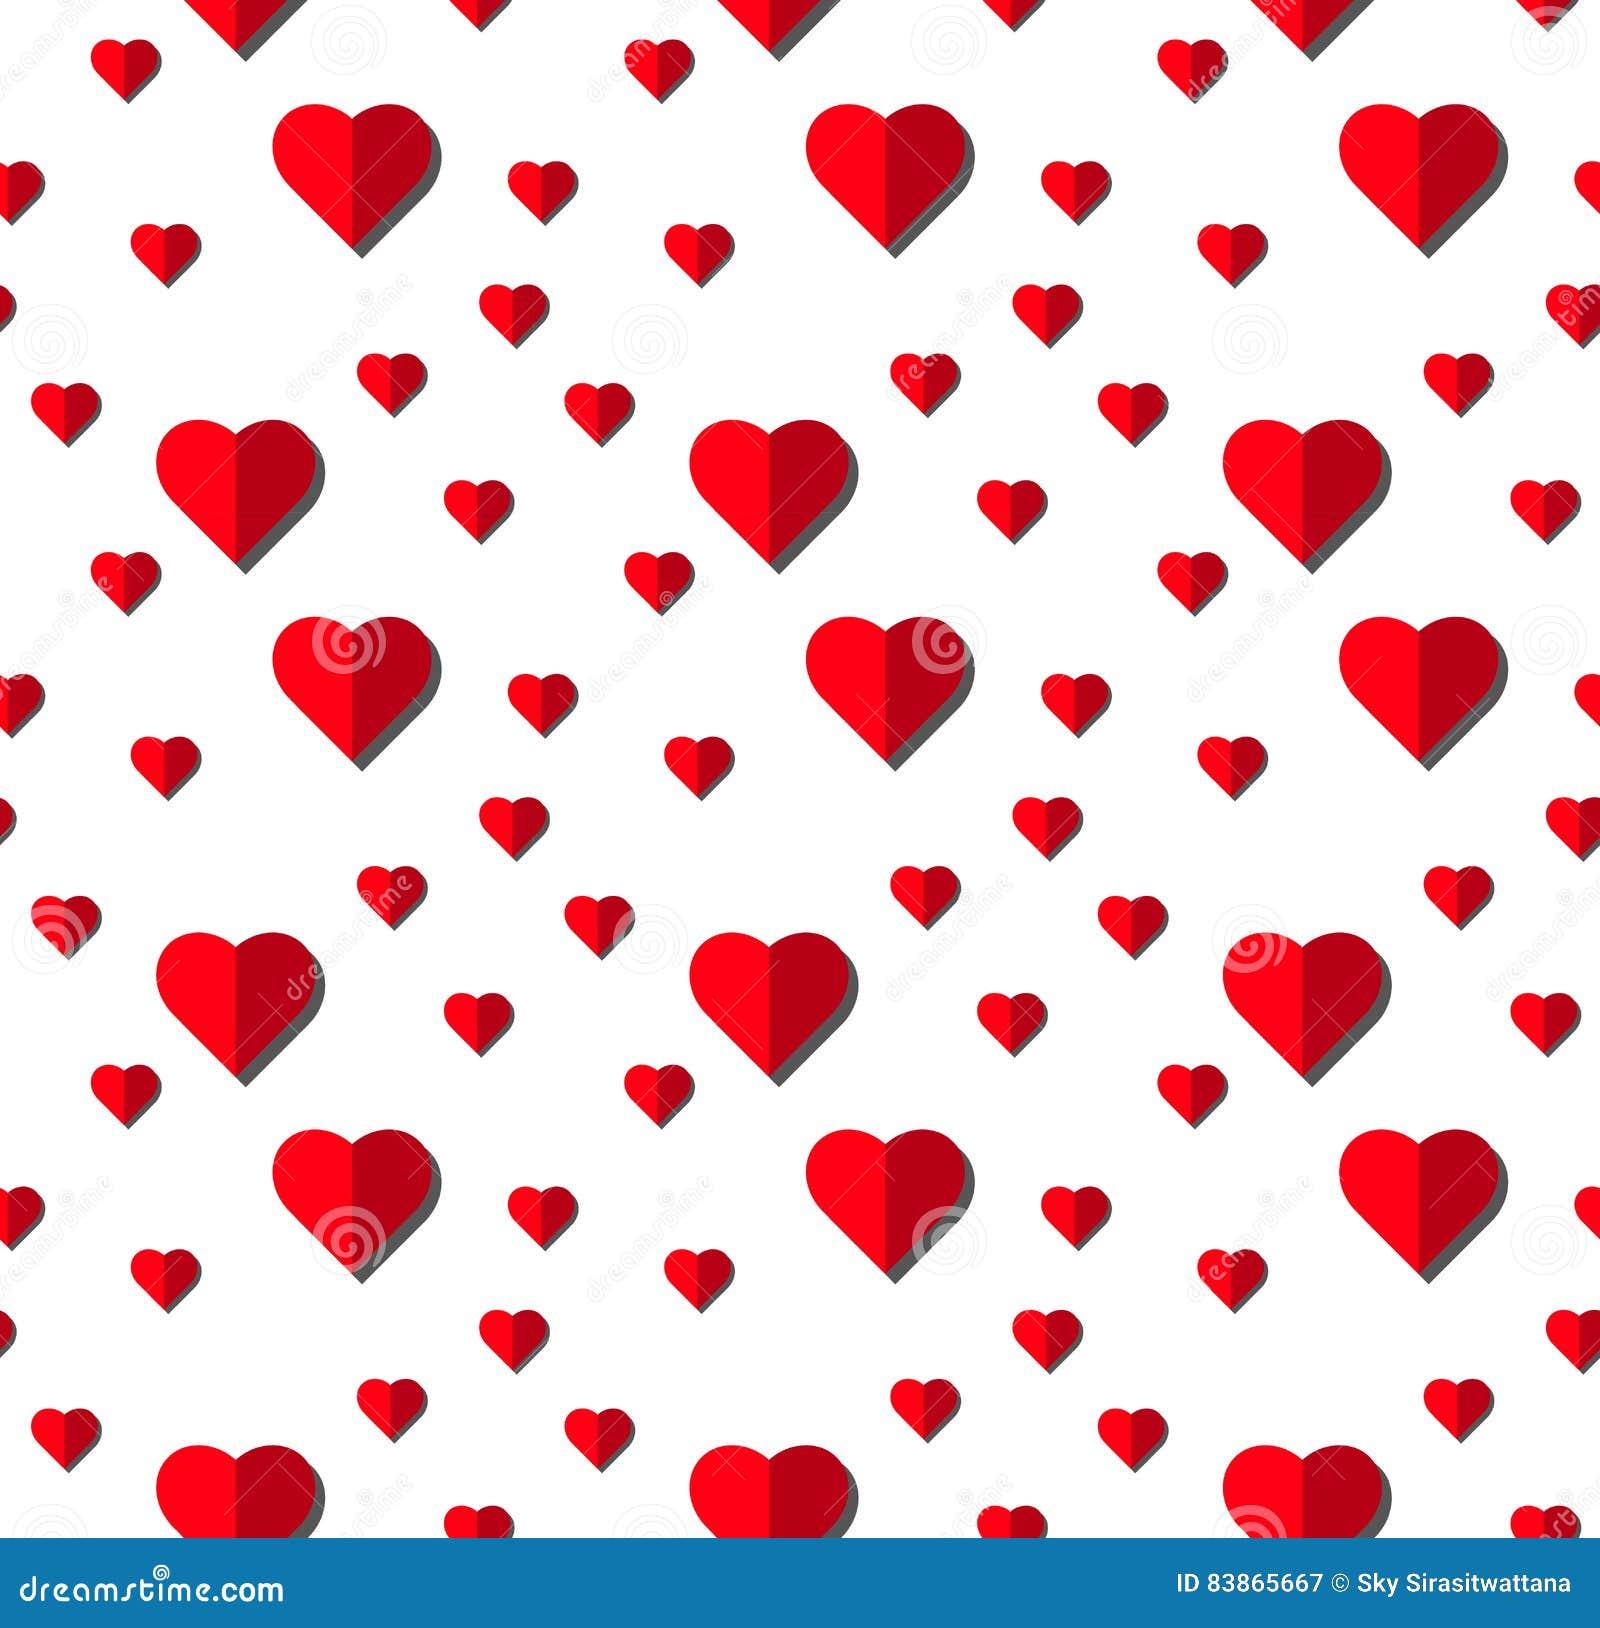 Heart Vector Seamless Pattern On White Background, Illustration ...